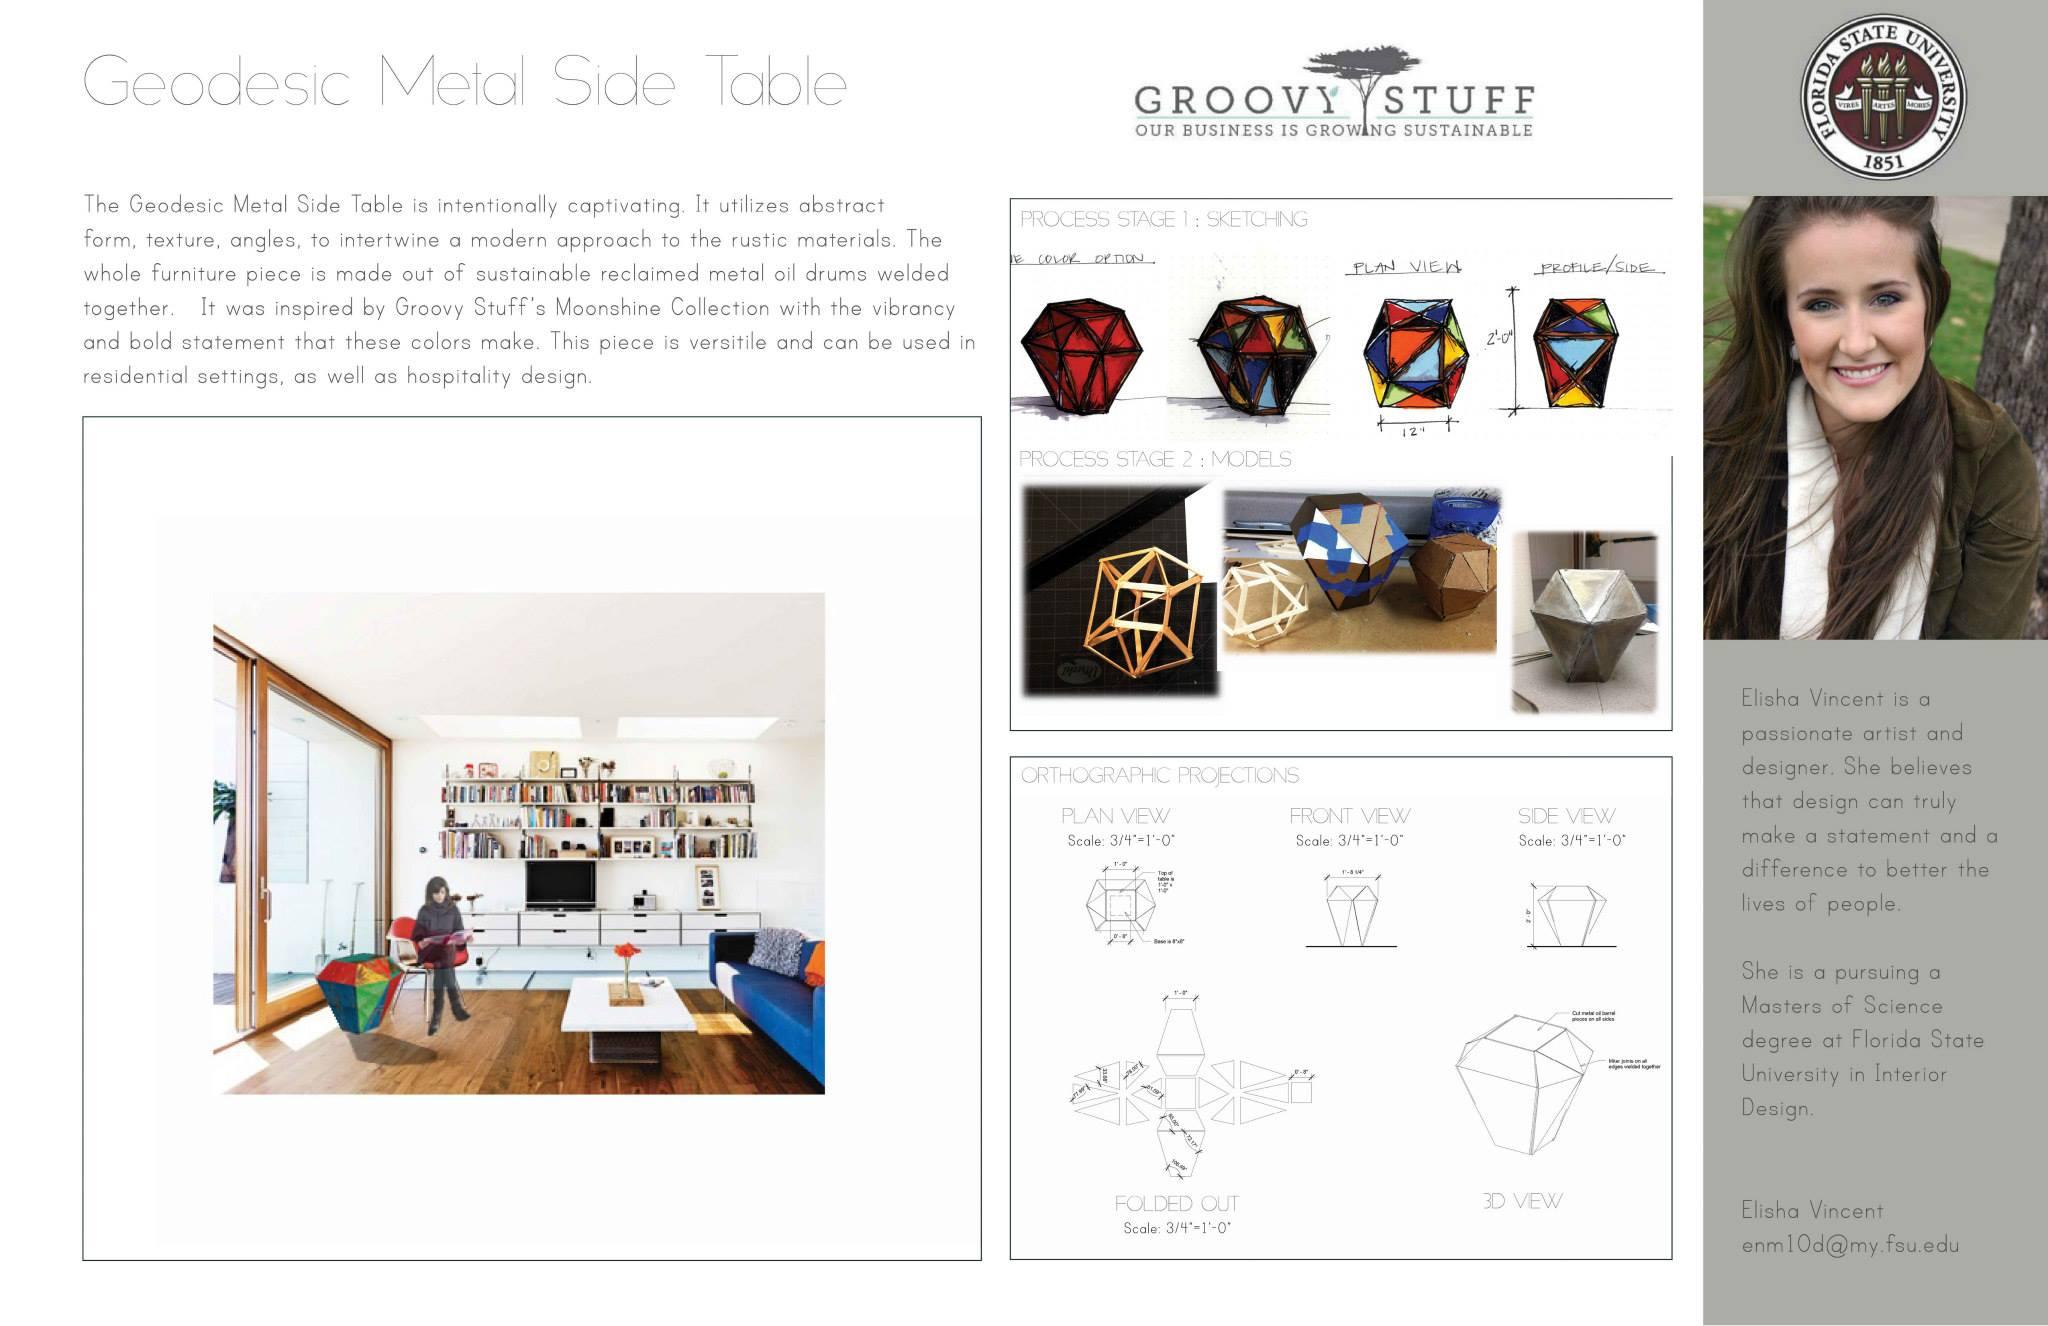 Fsu College Of Fine Arts Groovystuff Interior Design